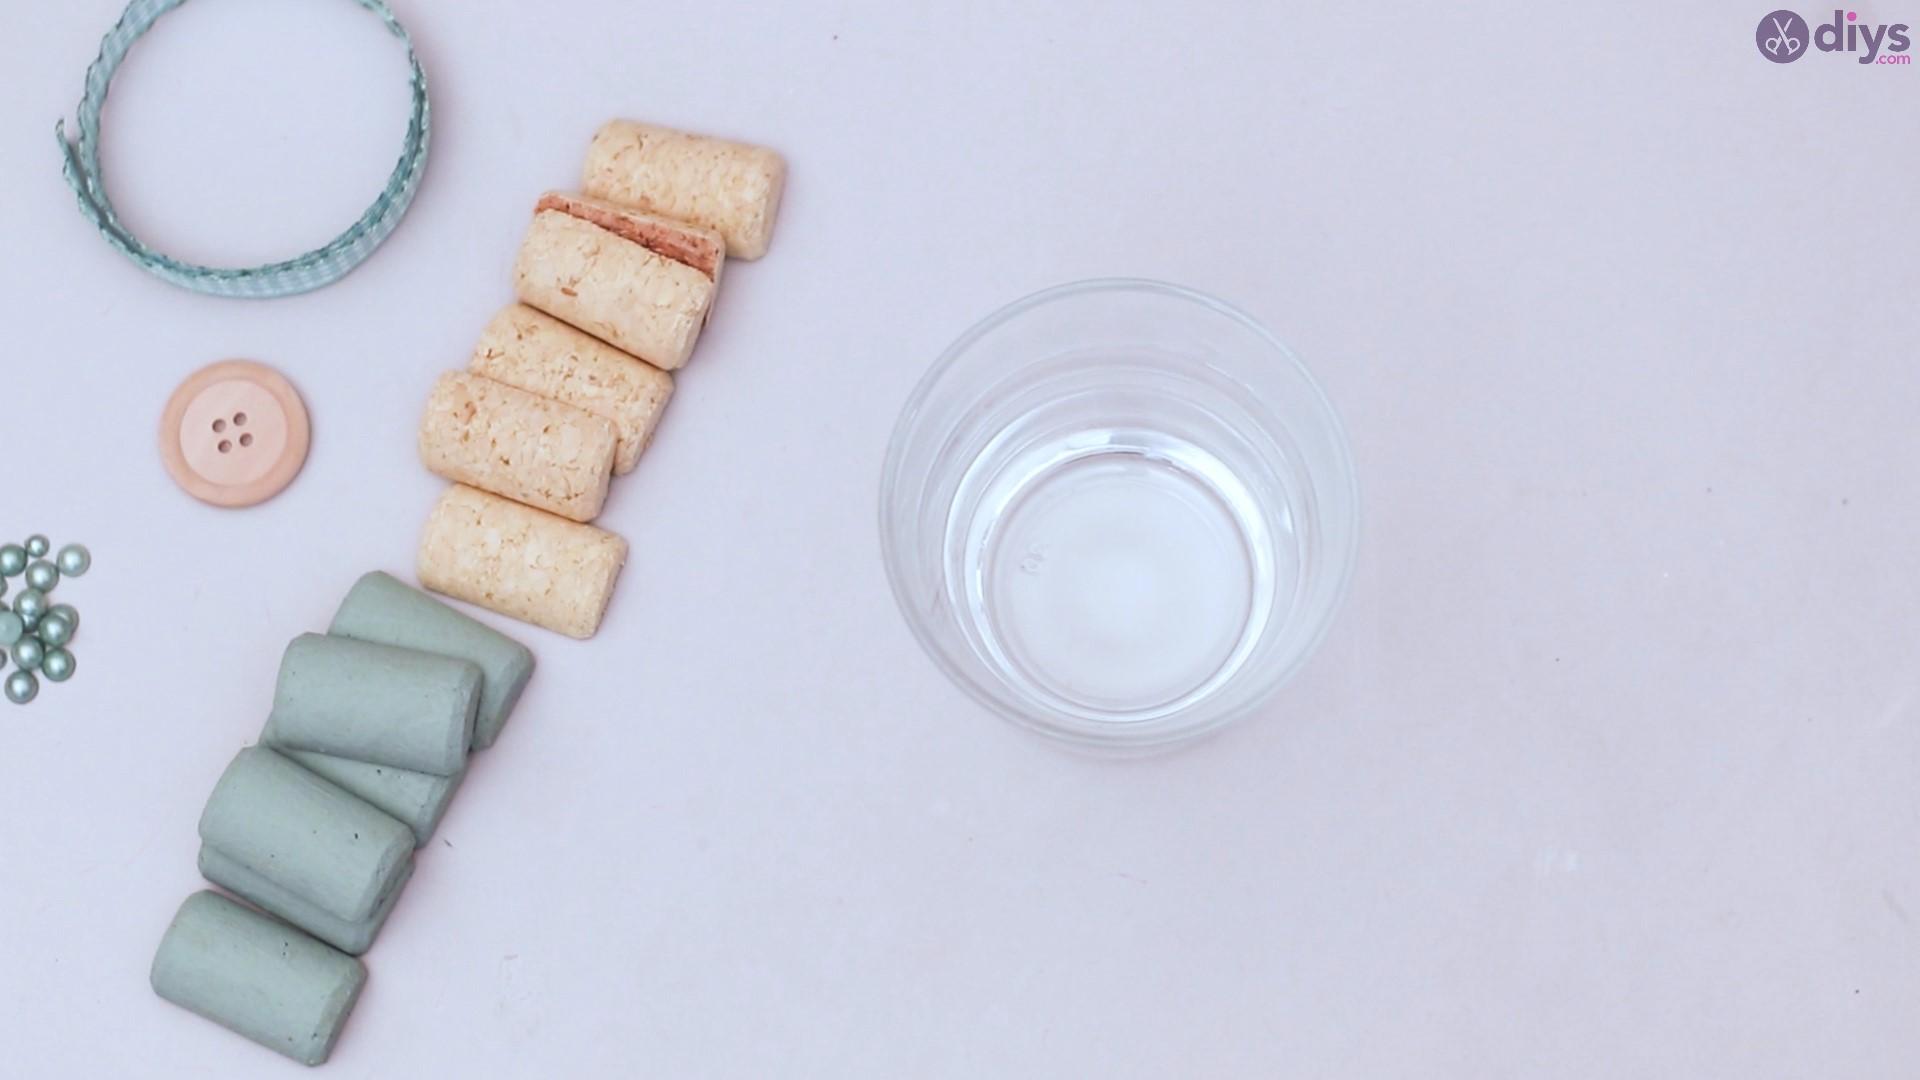 Diy wine cork candle holder (9)